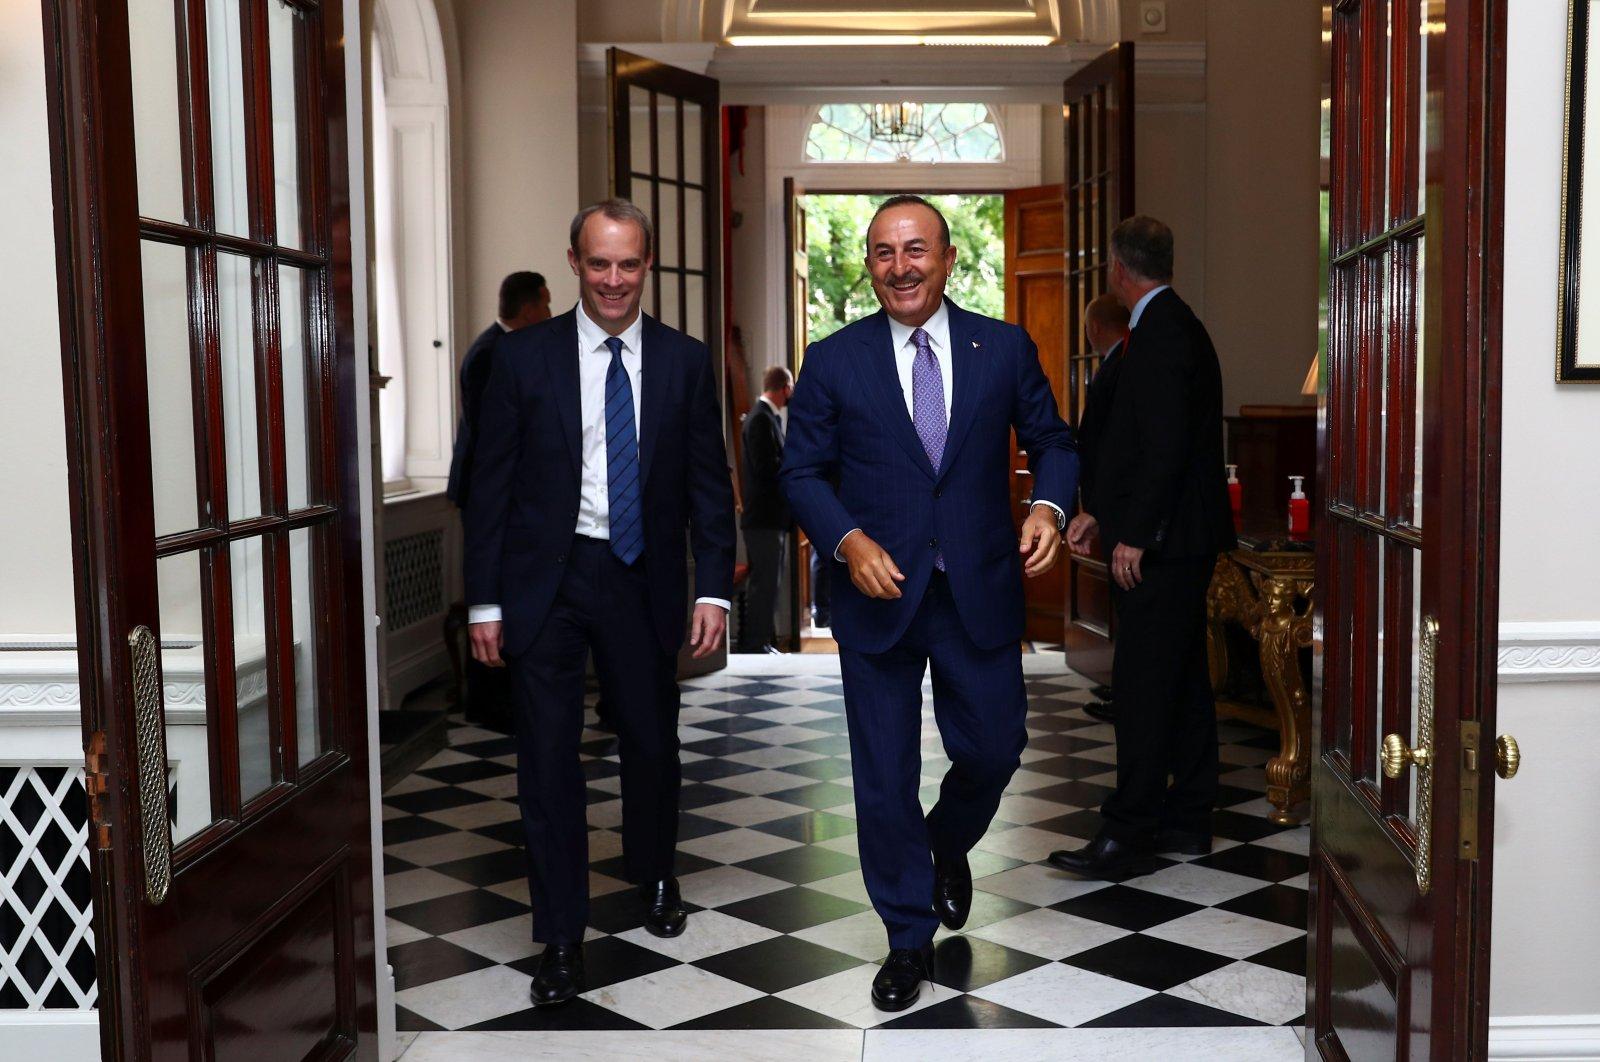 British Foreign Secretary Dominic Raab (L) and his Turkish counterpart Mevlüt Çavuşoğlu walk at Carlton Gardens ahead of a meeting in London, July 8, 2020. (AFP Photo)